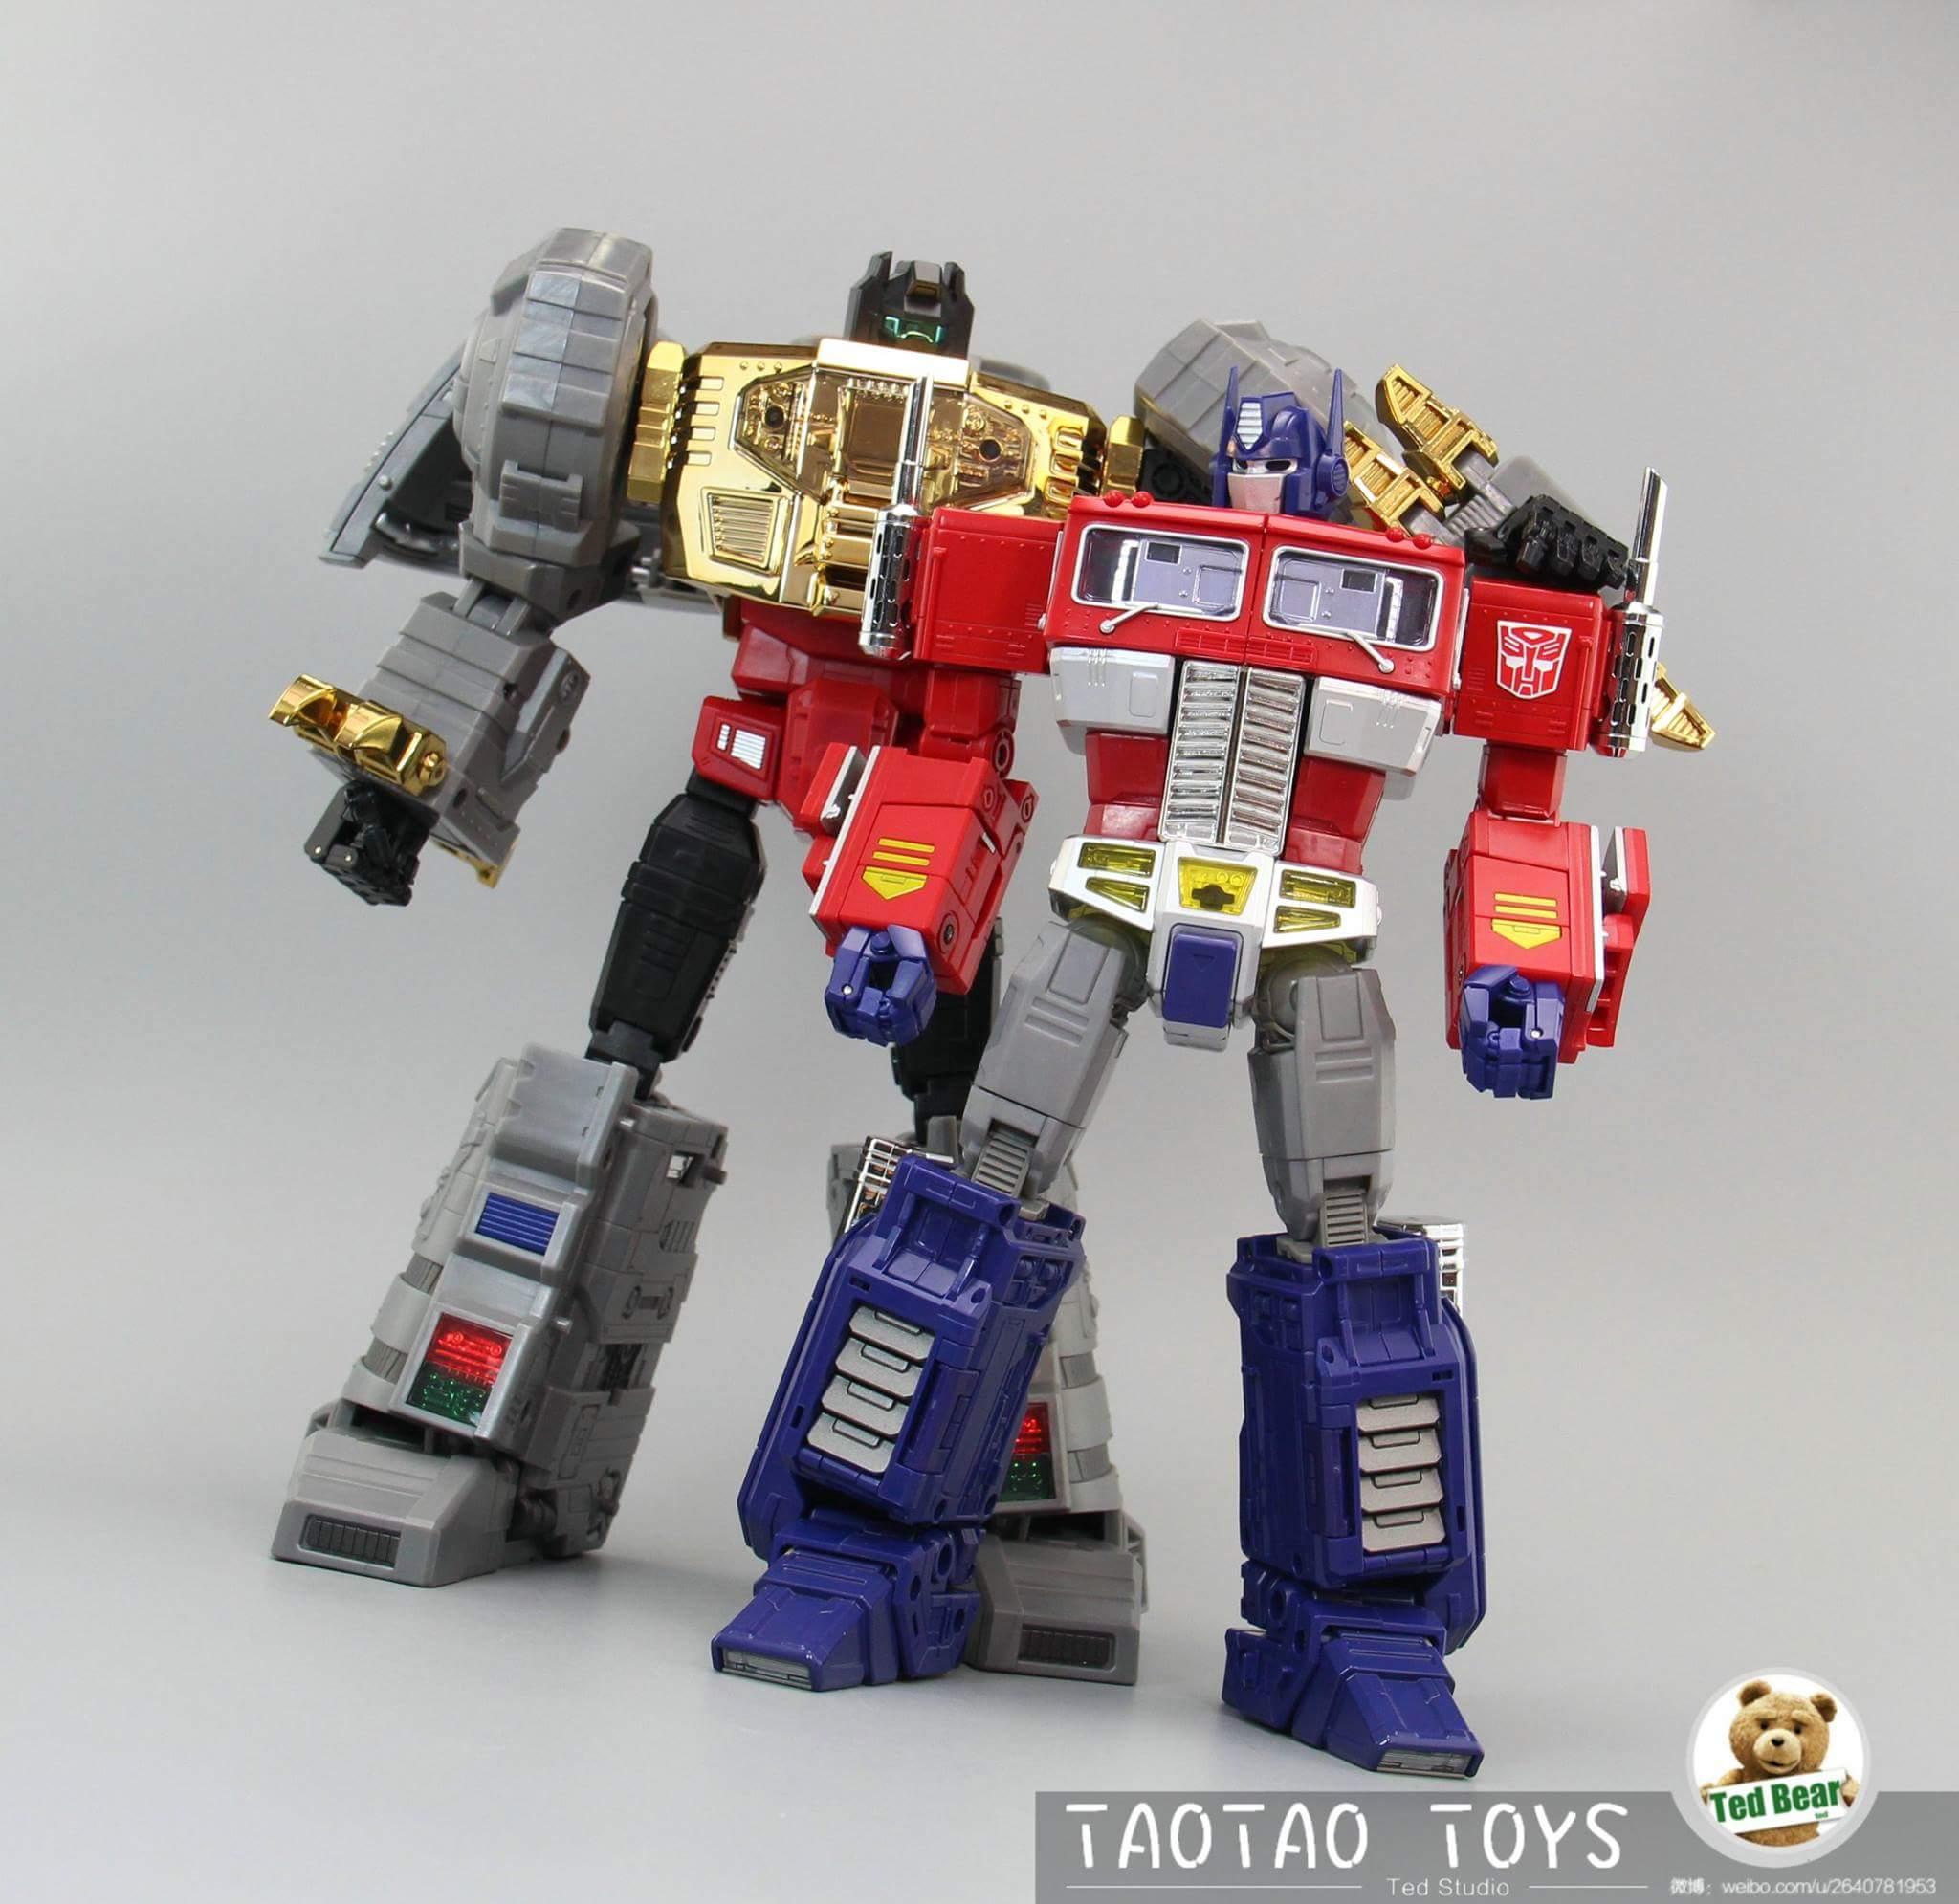 [Fanstoys] Produit Tiers - Dinobots - FT-04 Scoria, FT-05 Soar, FT-06 Sever, FT-07 Stomp, FT-08 Grinder - Page 10 1eSg5cEB